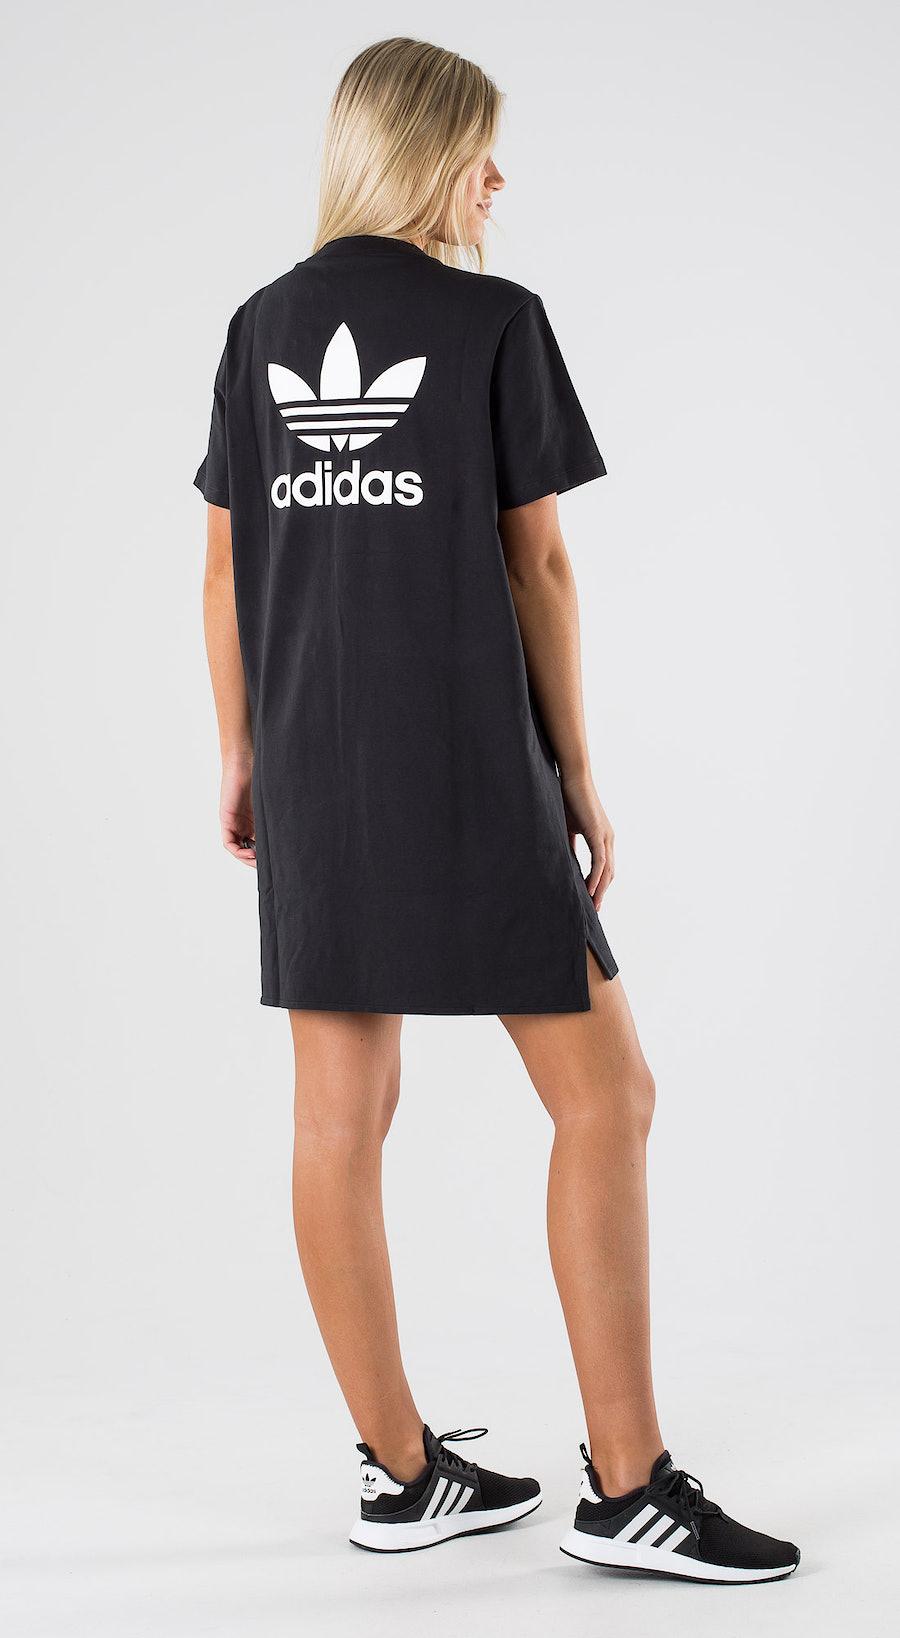 Adidas Originals Trefoil Dress Black White Outfit Multi